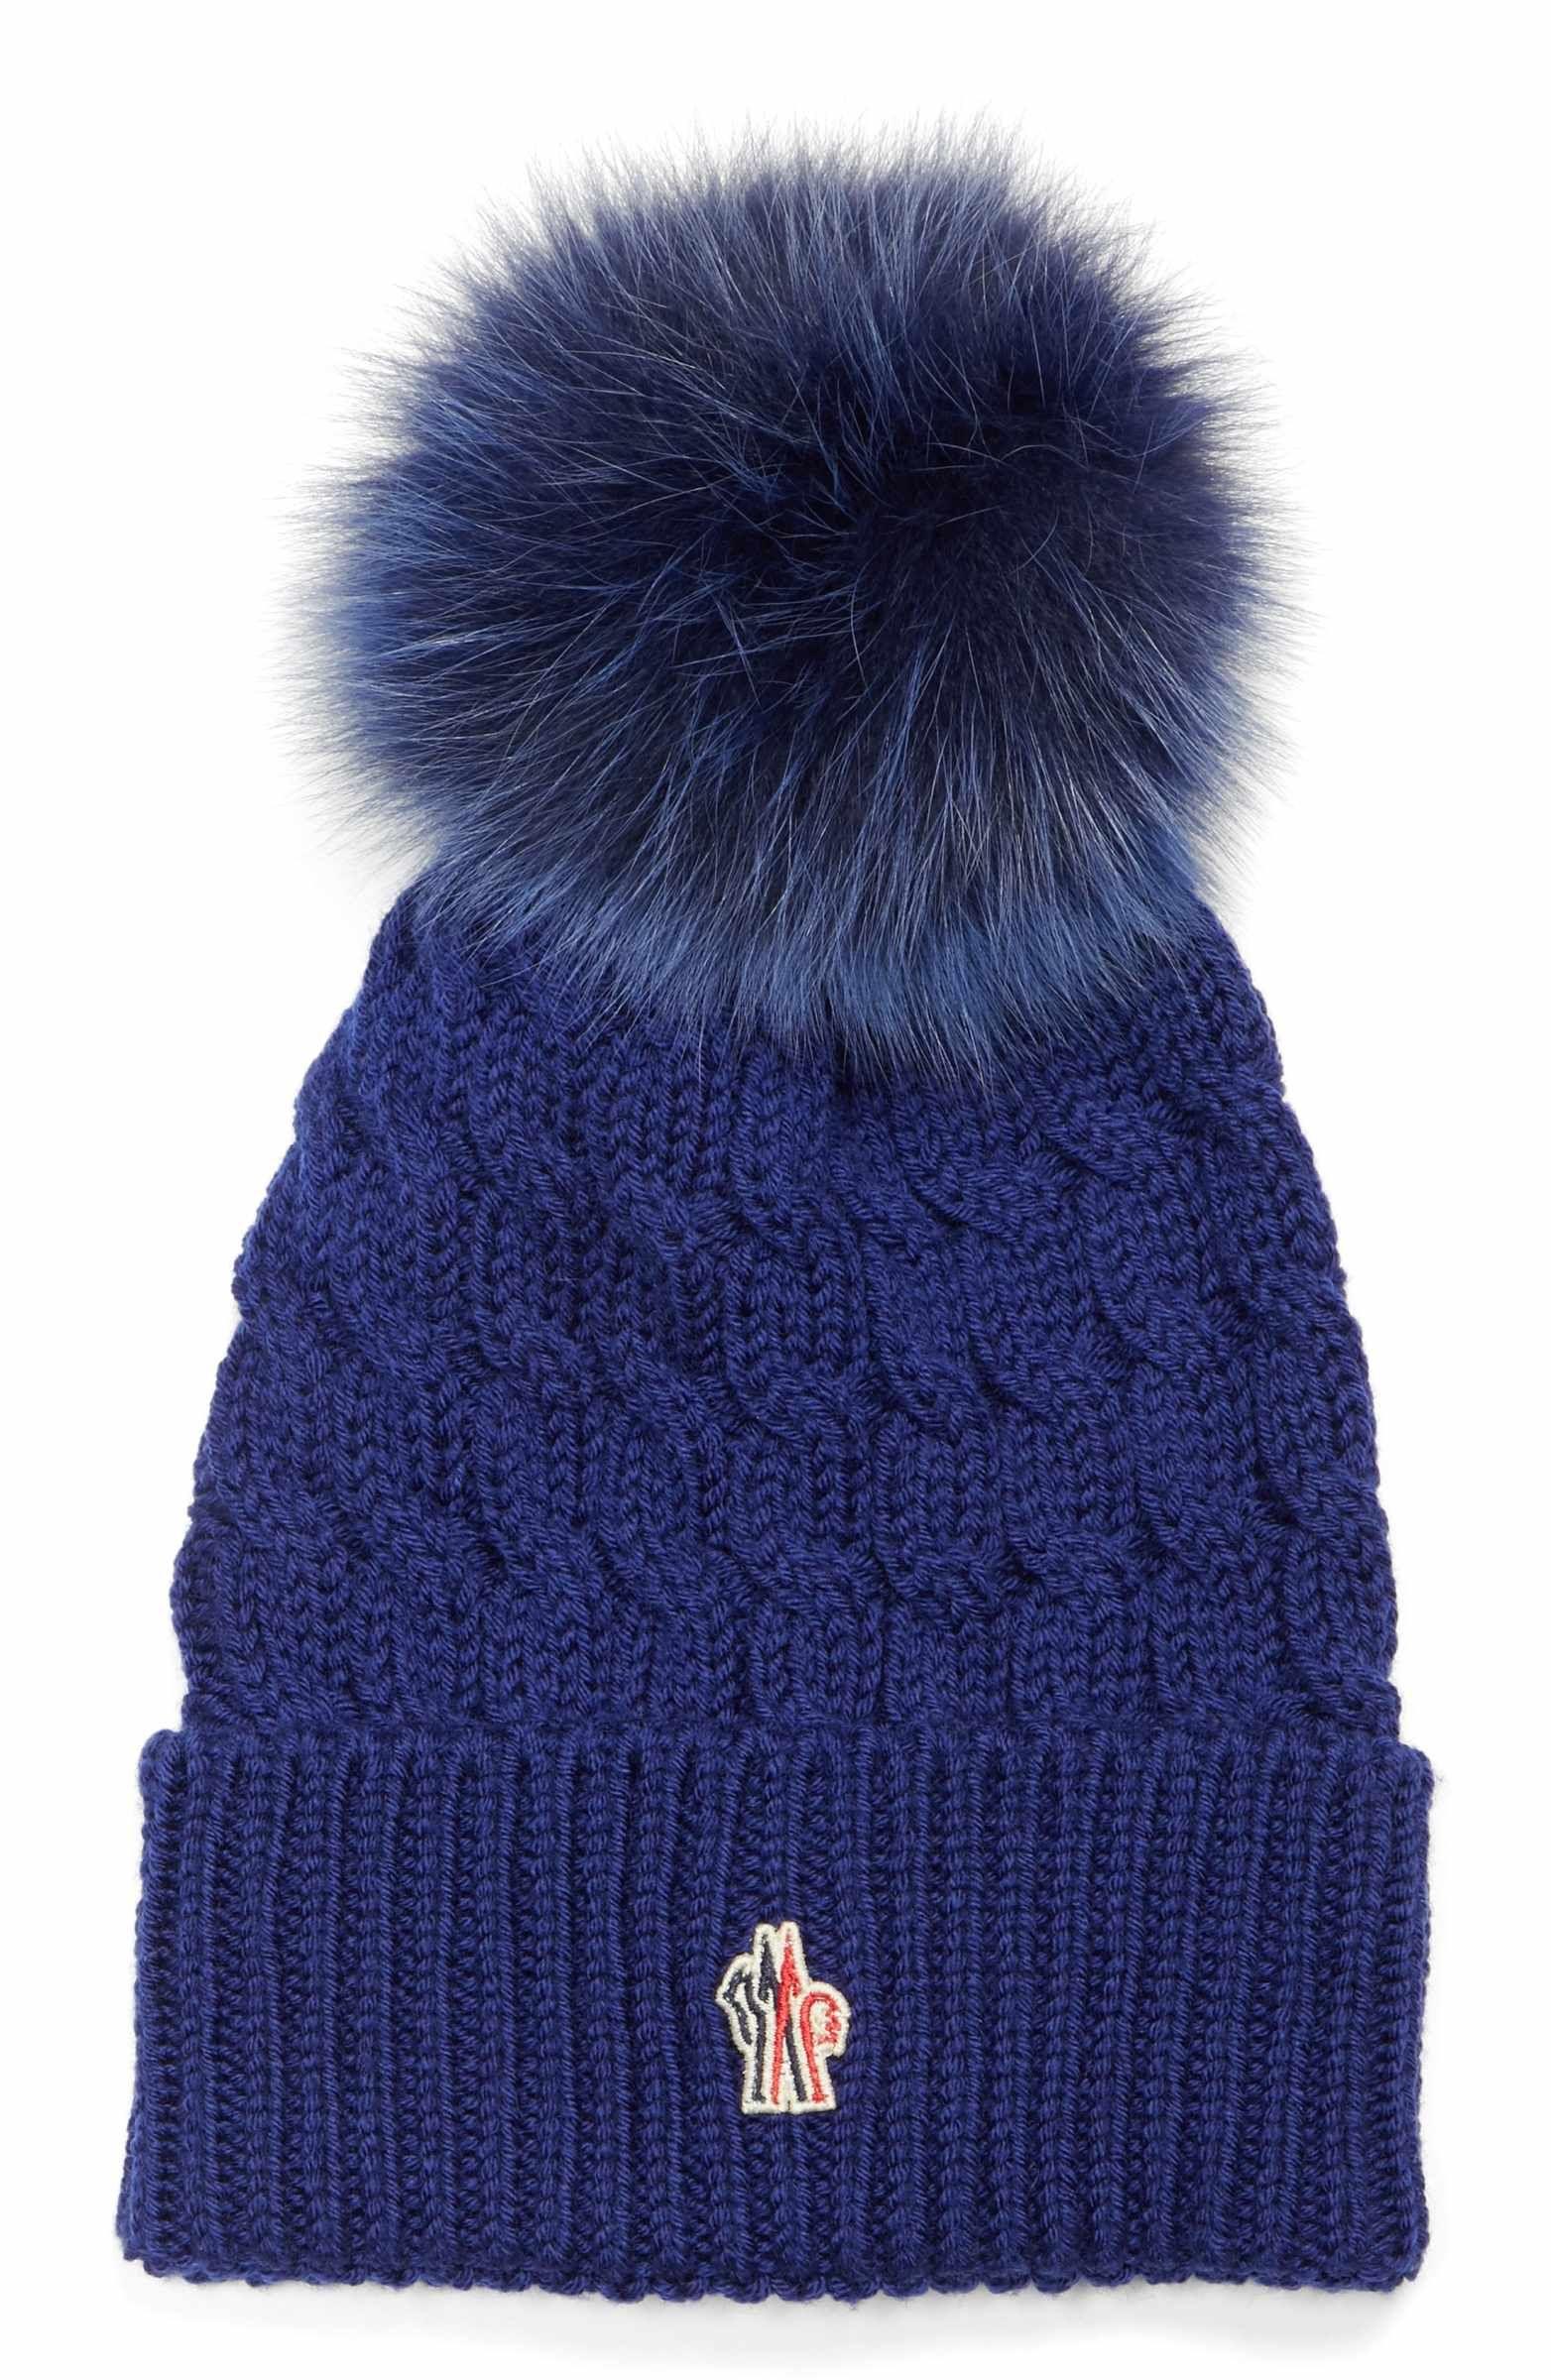 5fbcae06d1e Main Image - Moncler Genuine Fox Fur Pom Ribbed Wool Beanie